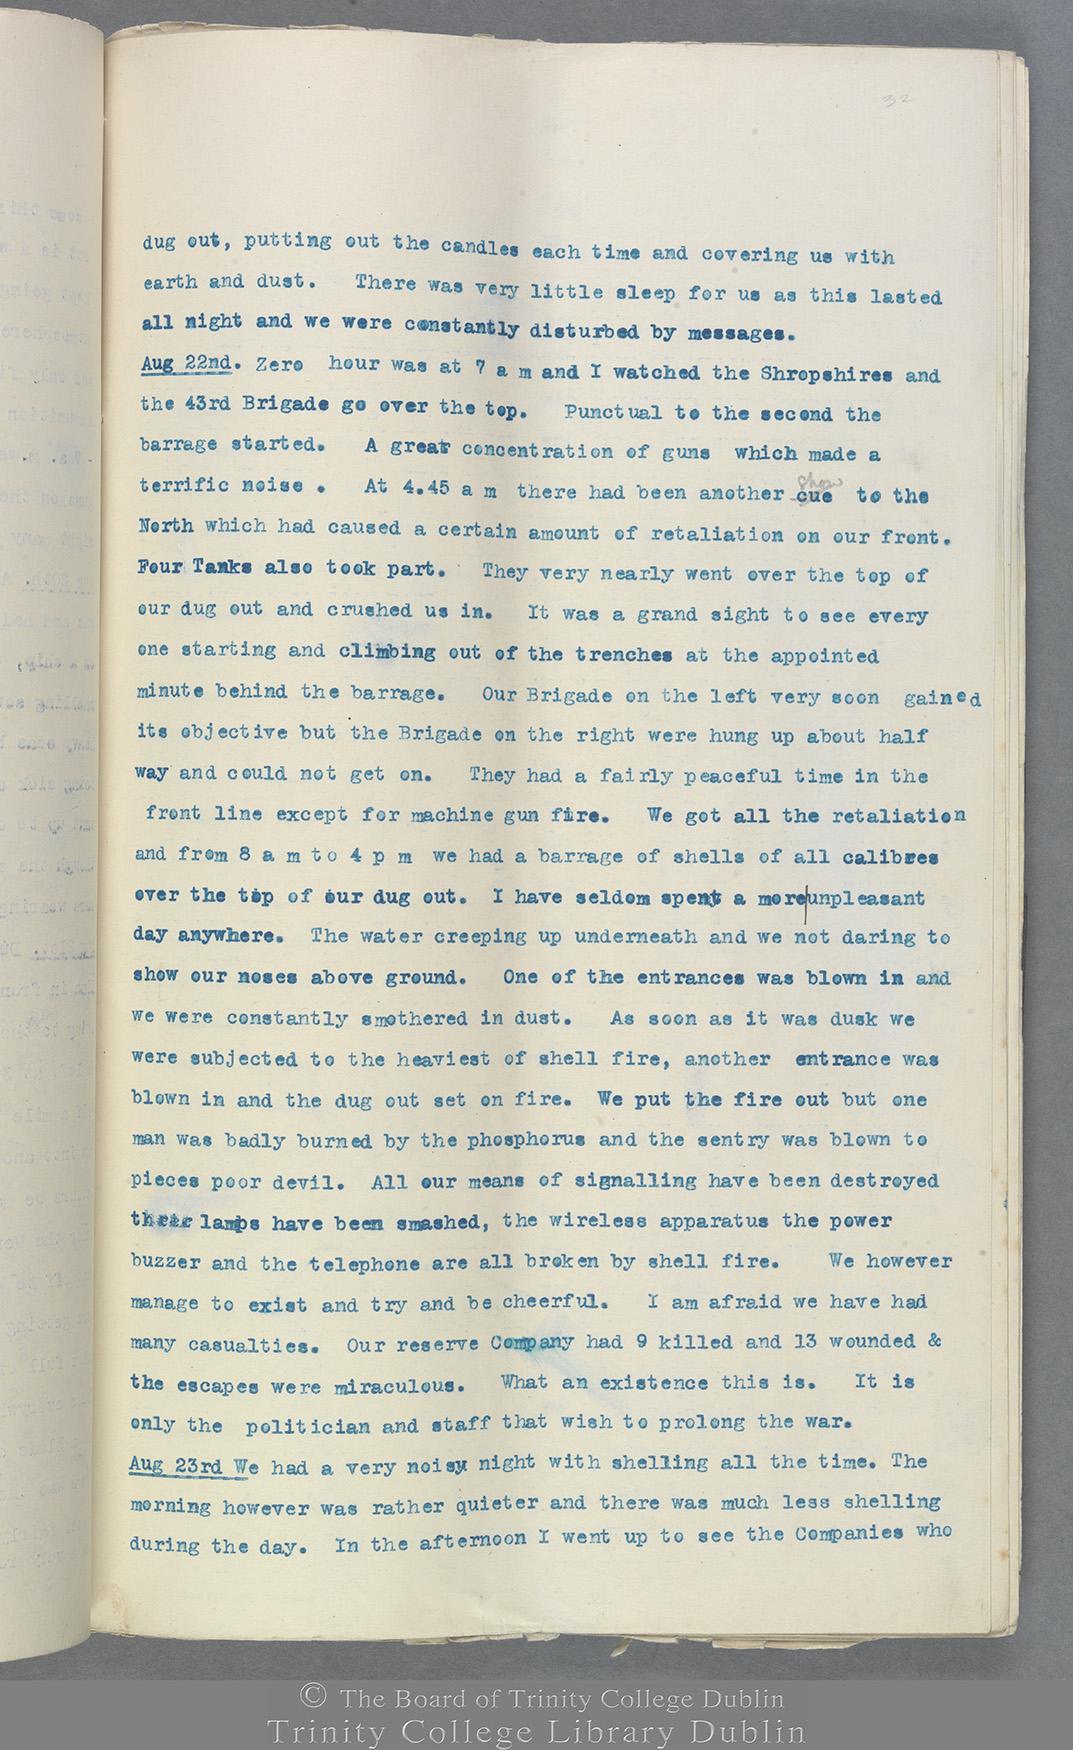 TCD MS 10822 folio 32 recto